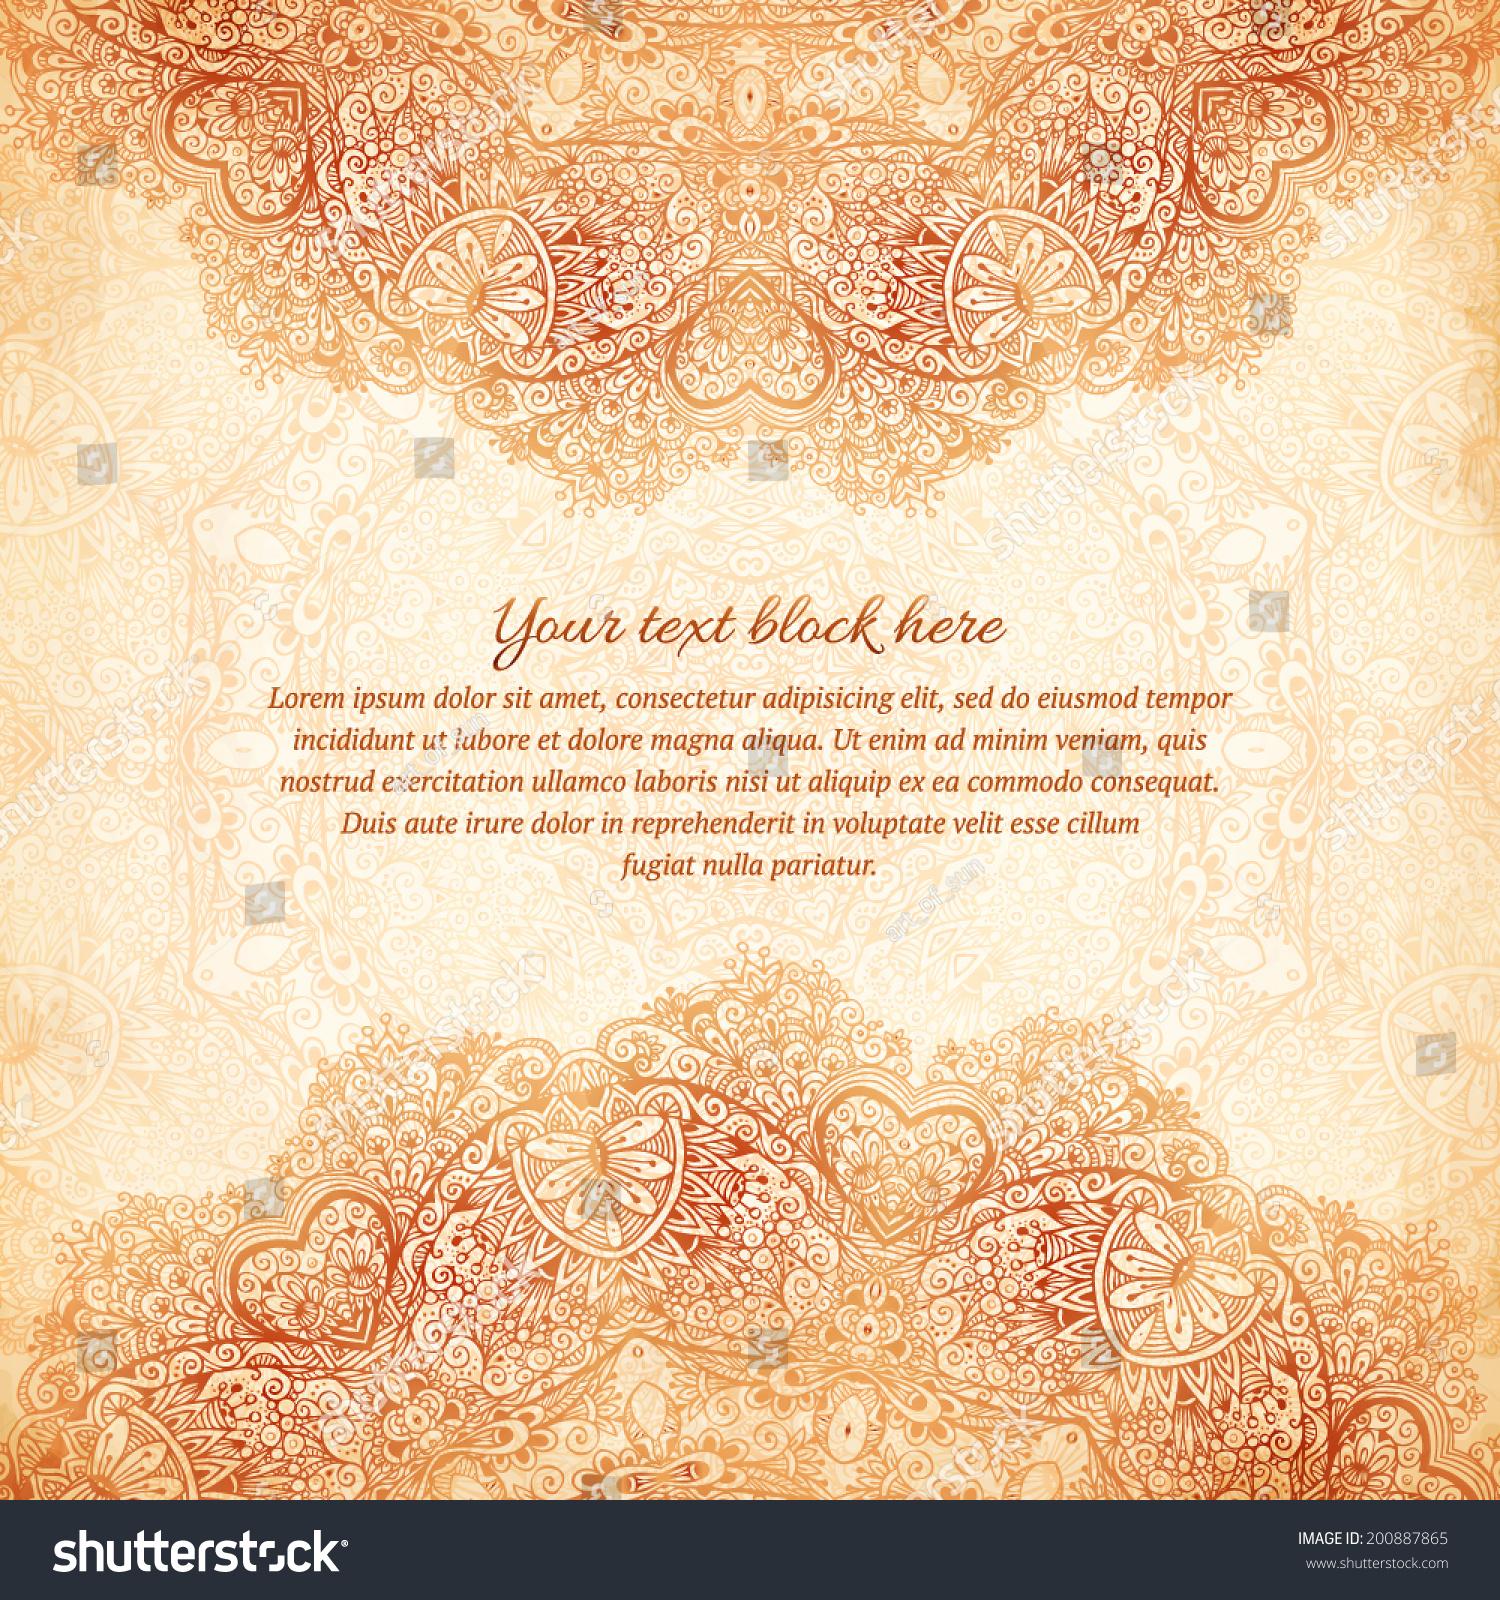 Ornate vintage vector background in mehndi style royalty free stock - Ornate Vintage Background In Mehndi Style